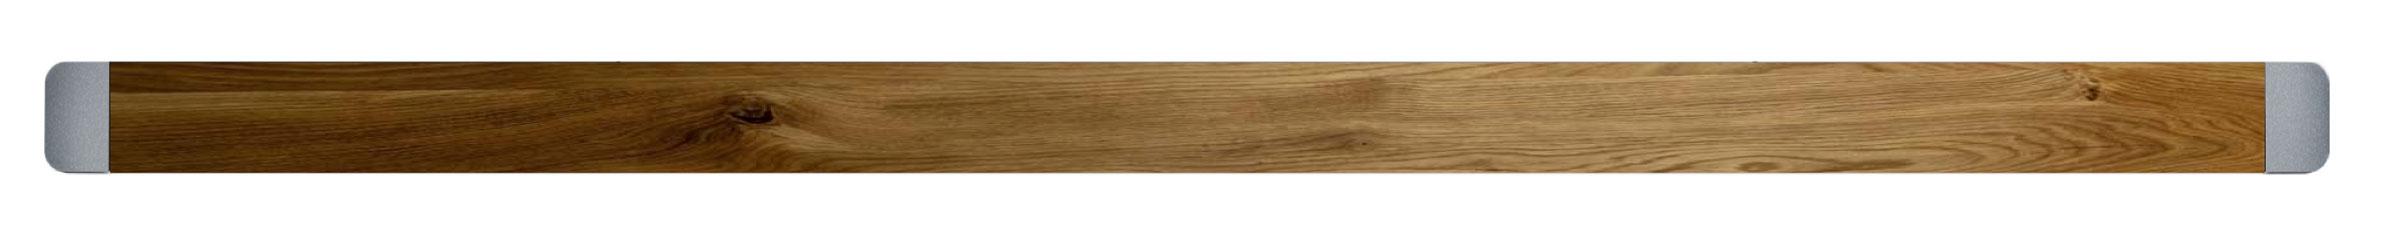 Stylecover Eiche dunkel (Naturholz)